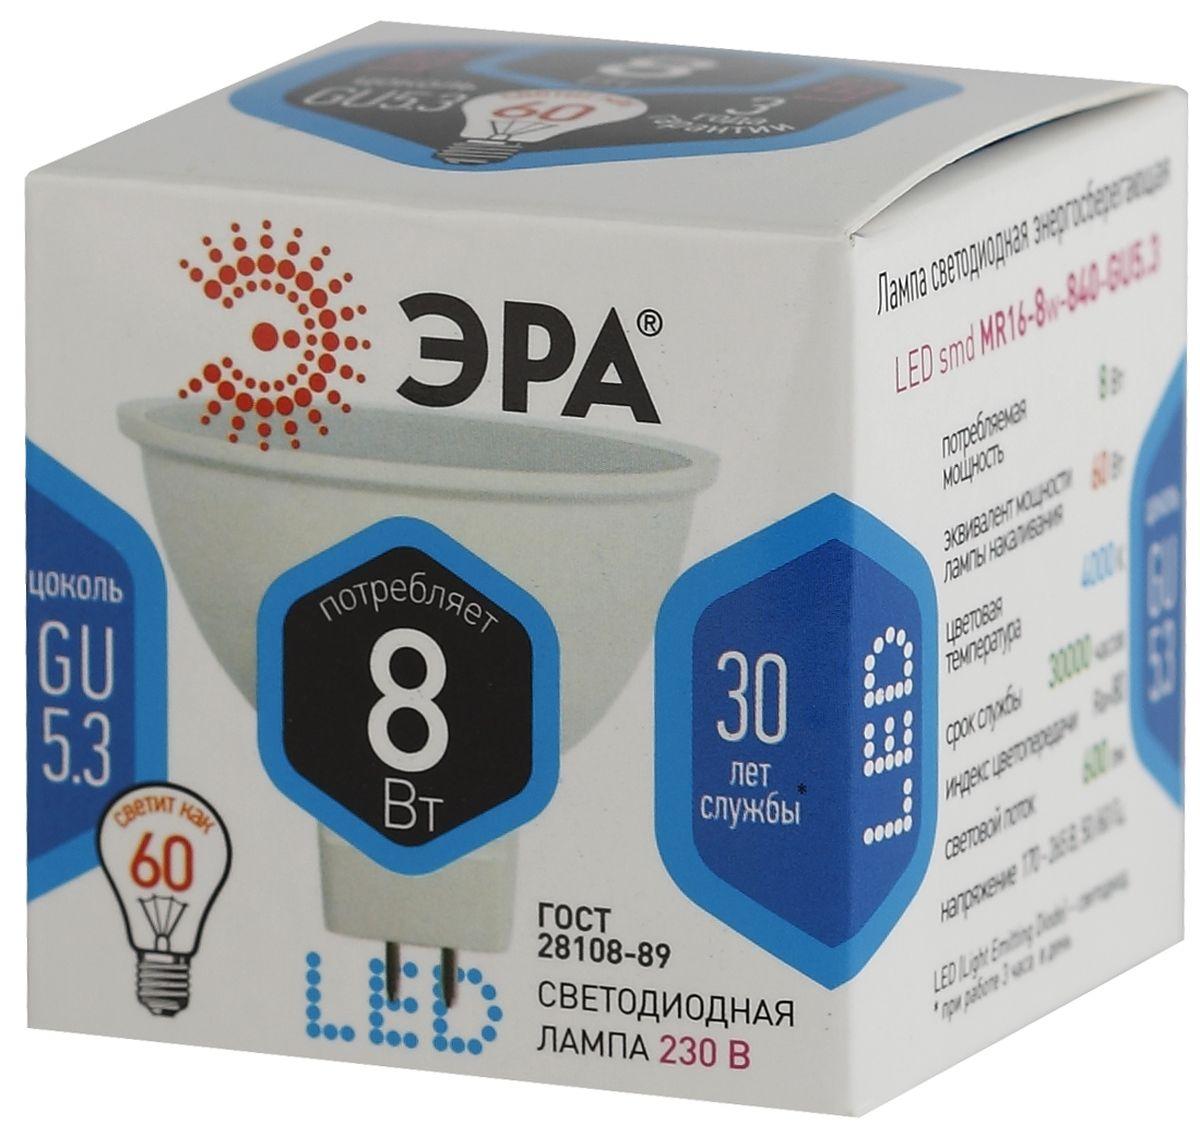 Лампа светодиодная ЭРА, LED smd MR16-8w-840-GU5.35055945518498